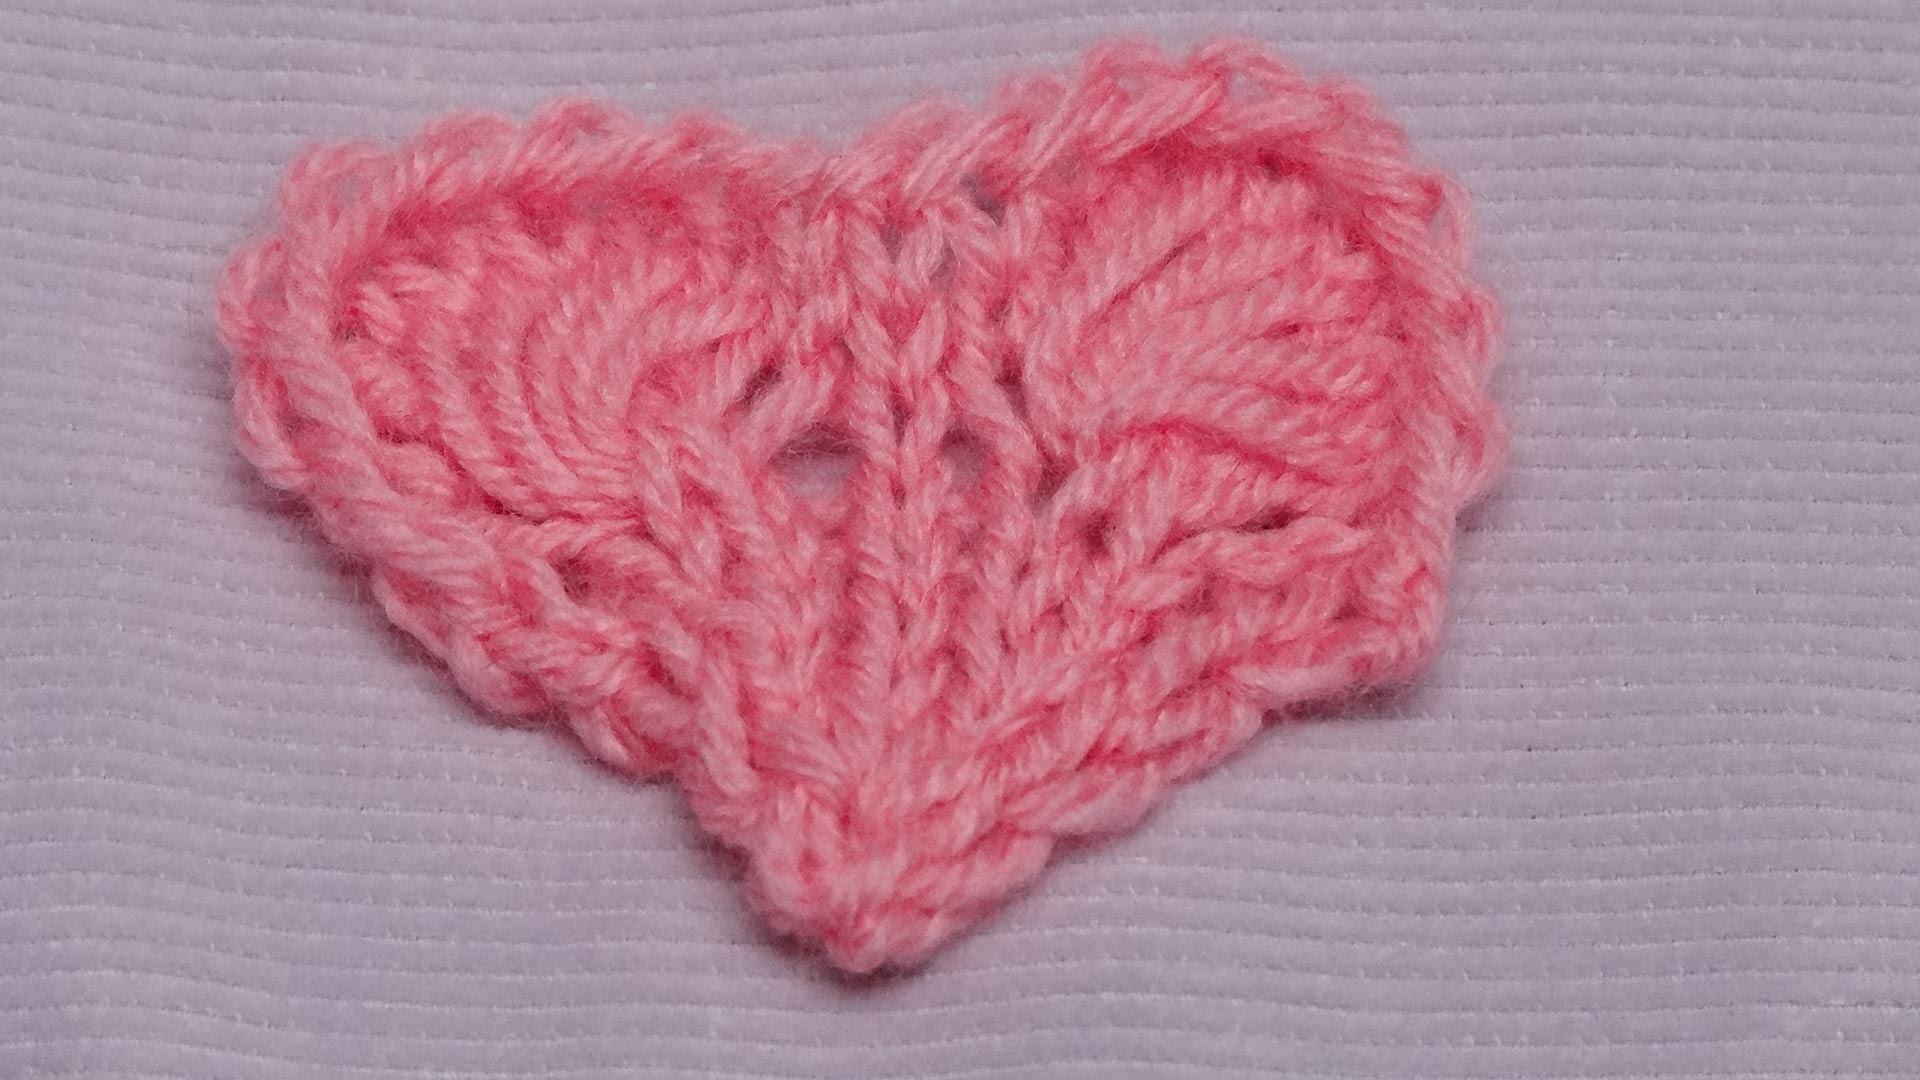 Lace-Herz mit langen Maschen - Lace-Heart with long stitches - Strickmuster - Knitting Pattern